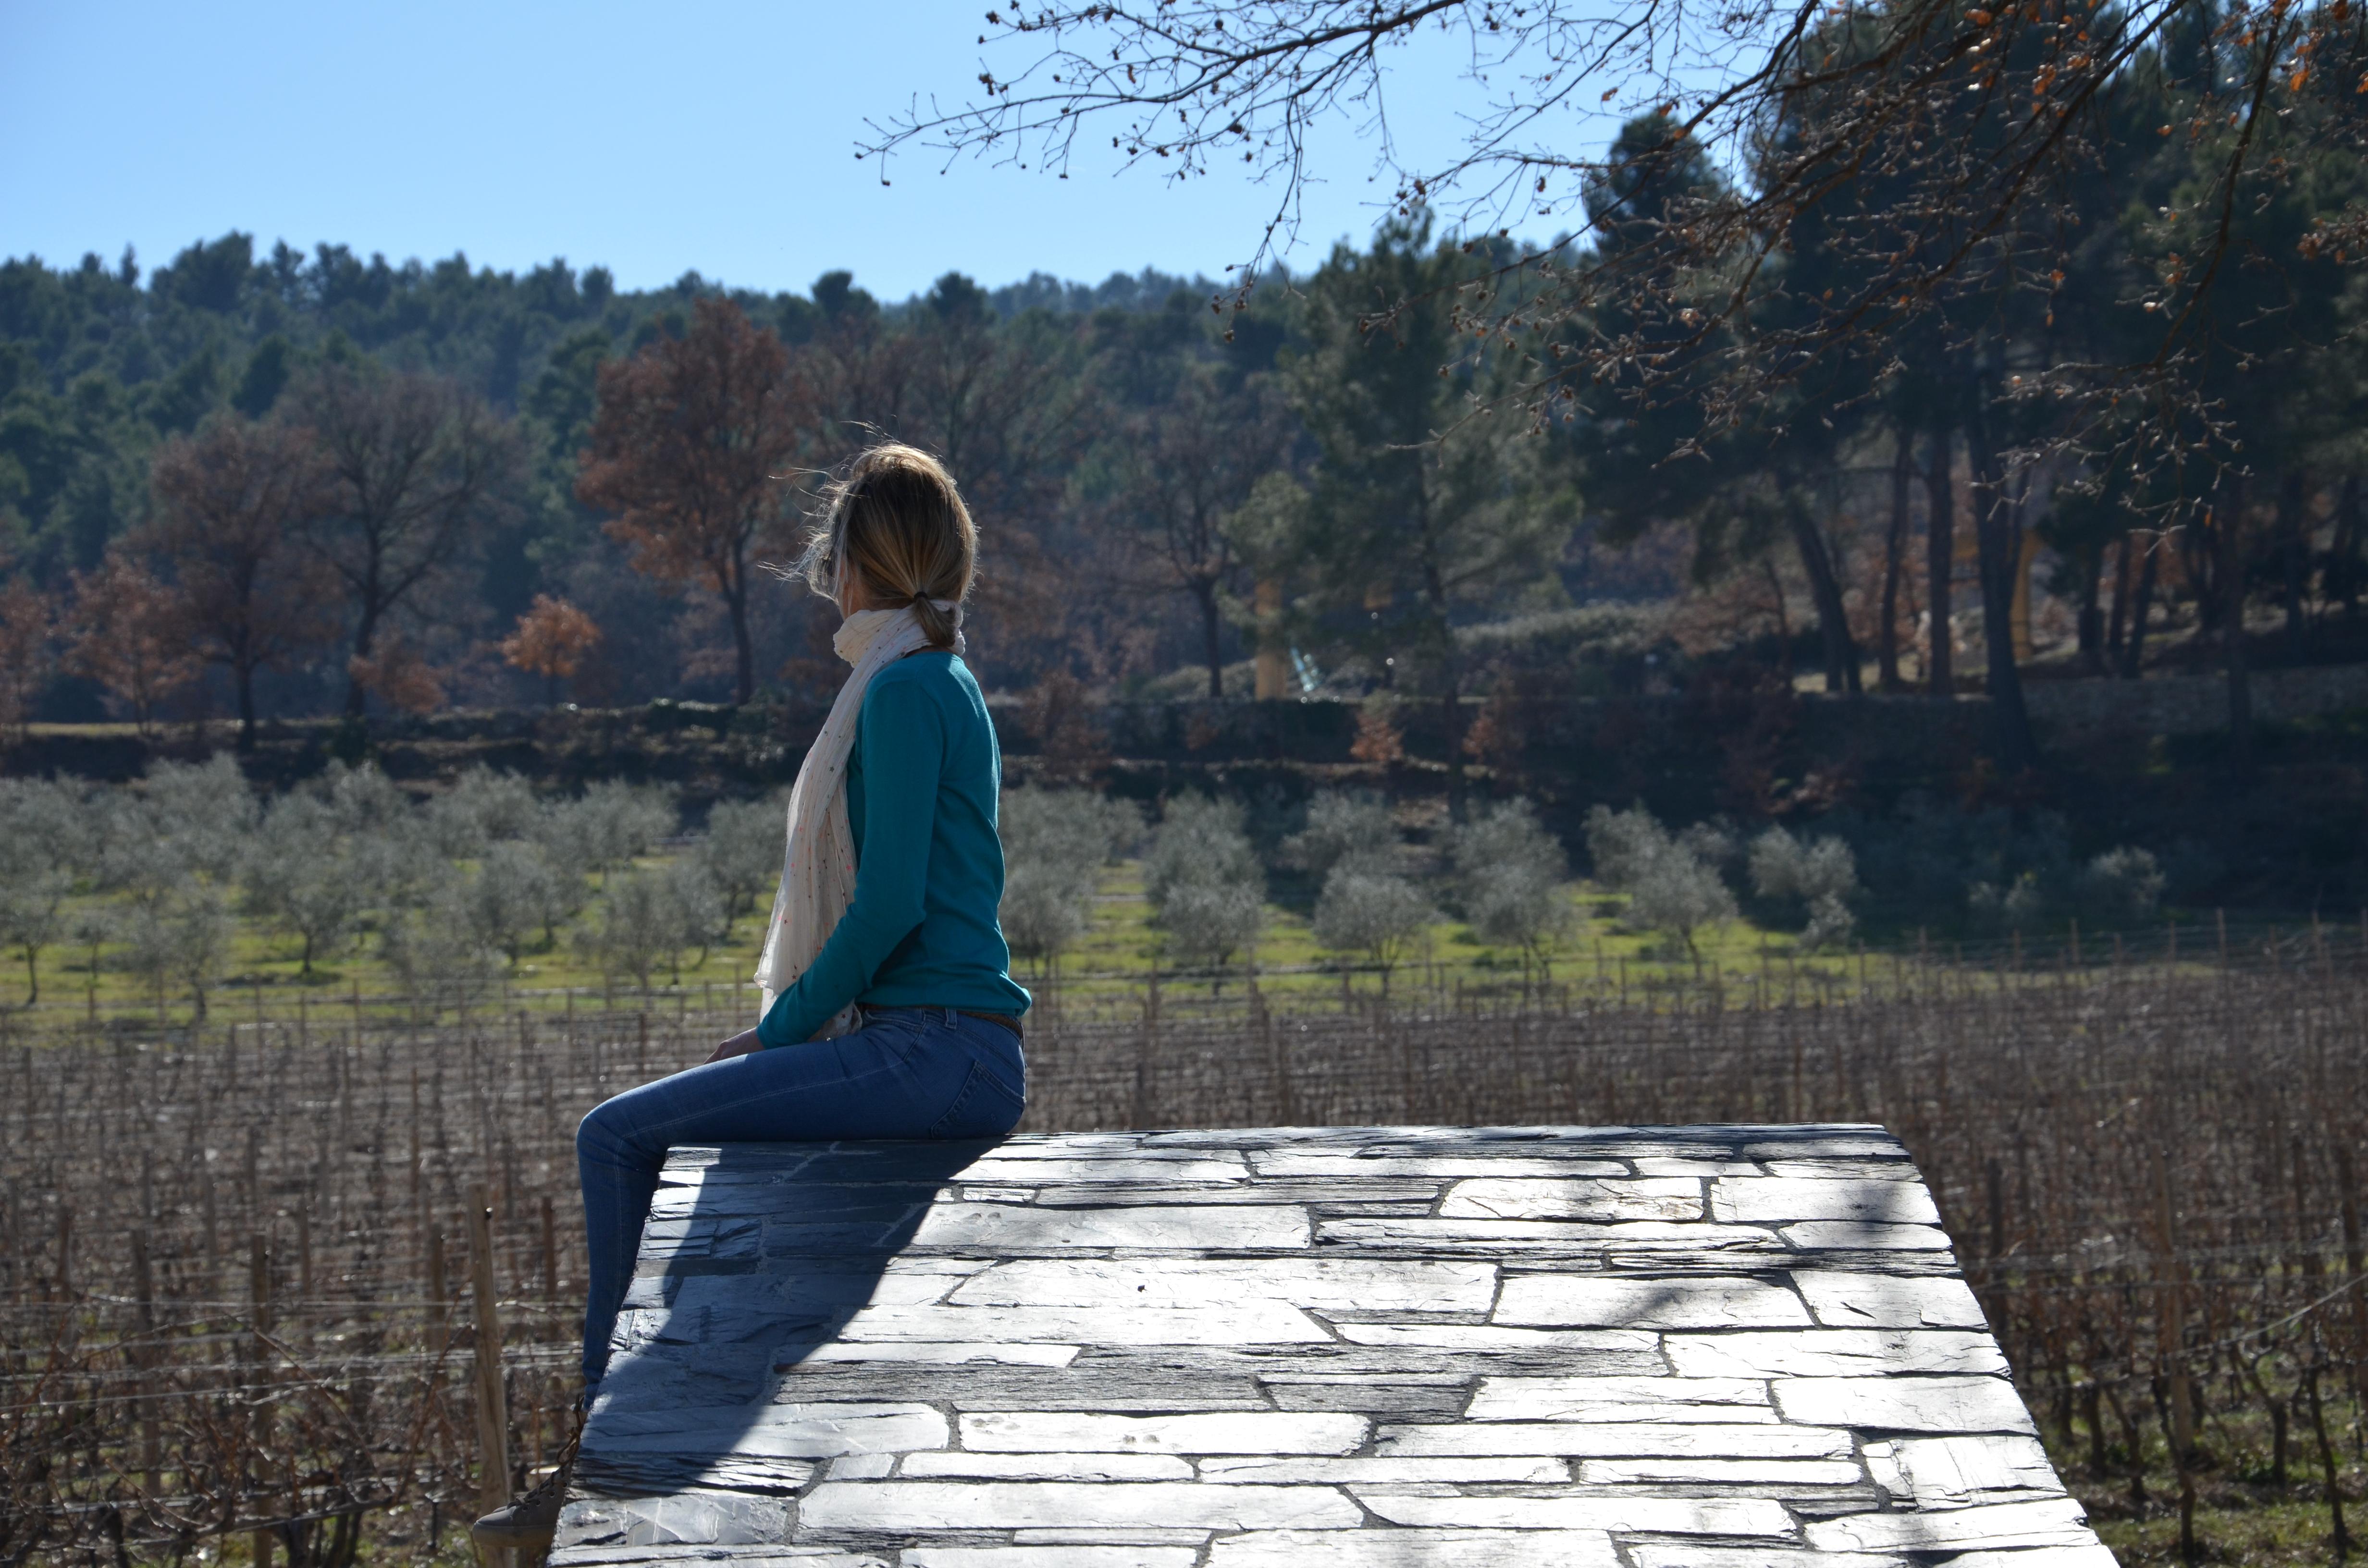 Provence - 04.04.2014 - www.MyFrenchLife.org